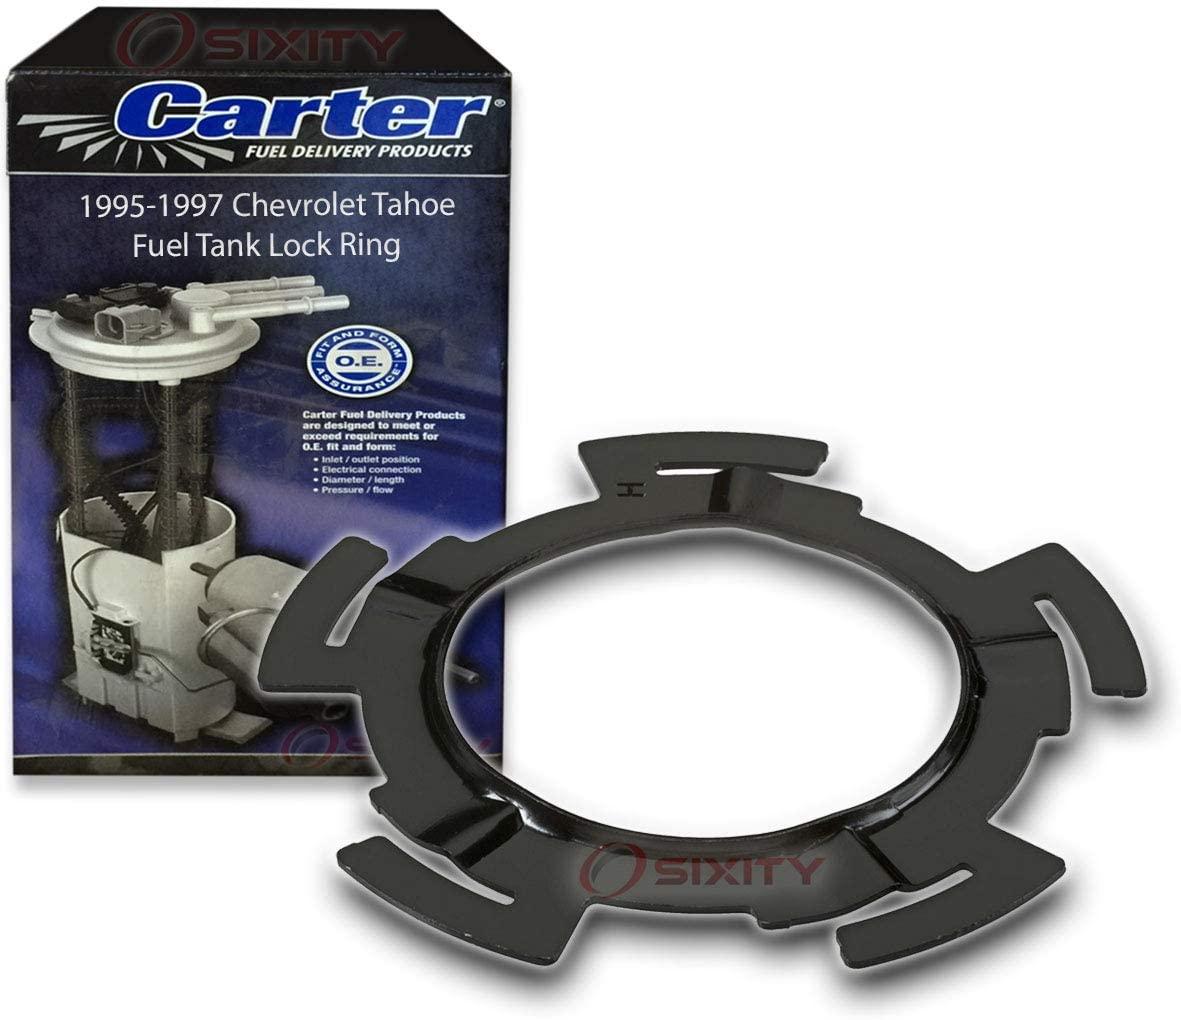 Carter Fuel Tank Lock Ring for 1995-1997 Chevrolet Tahoe 5.7L V8 - Pump Gas Diesel Gasoline Petrol